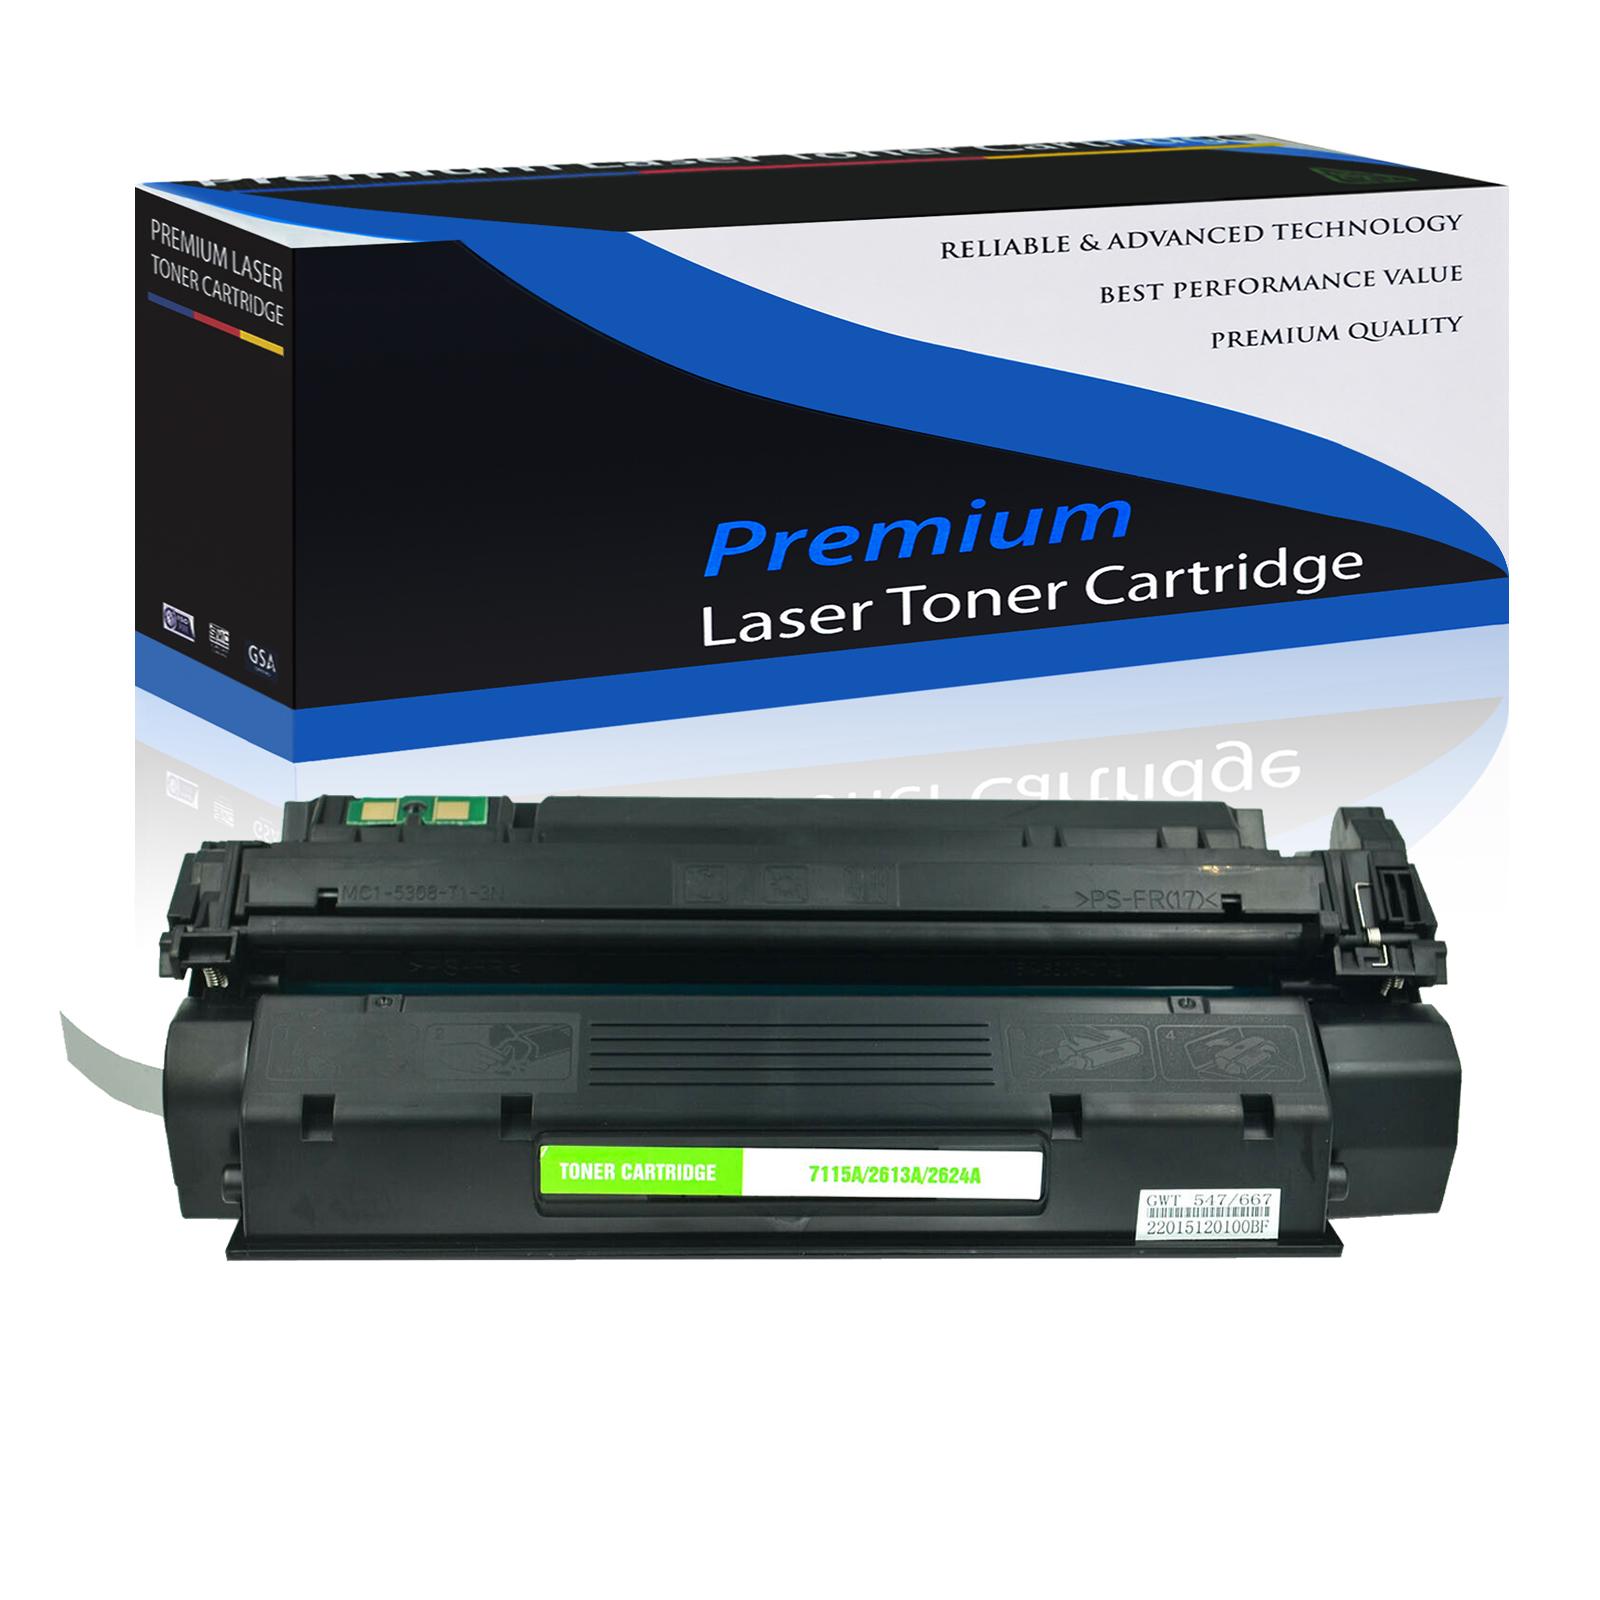 3 PK Laser New Toner Cartridge High Yield Black Compatible for HP LaserJet 1150